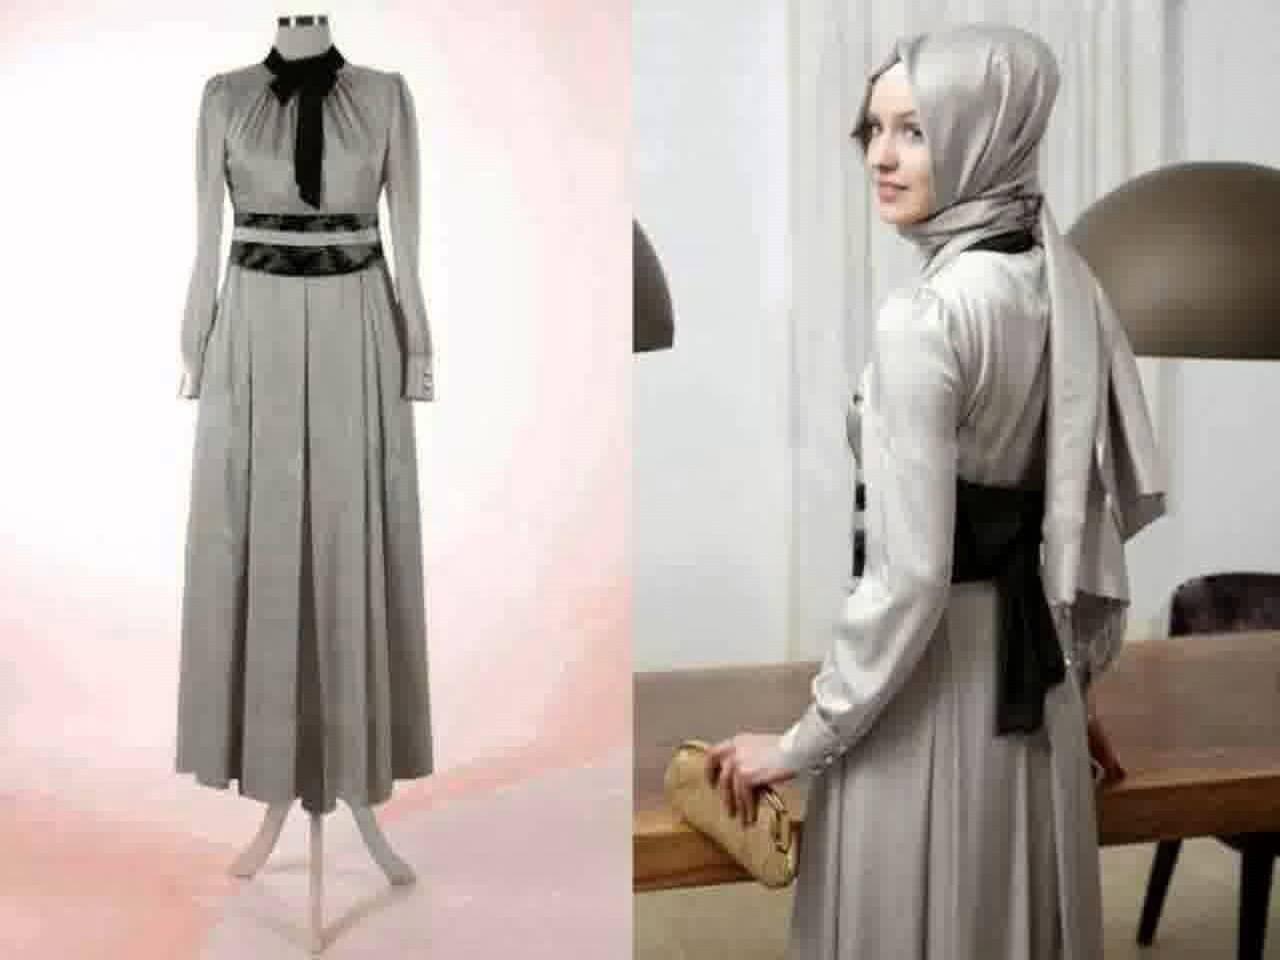 Bentuk Baju Lebaran Idul Adha 9ddf 25 Model Baju Lebaran Terbaru Untuk Idul Fitri 2018